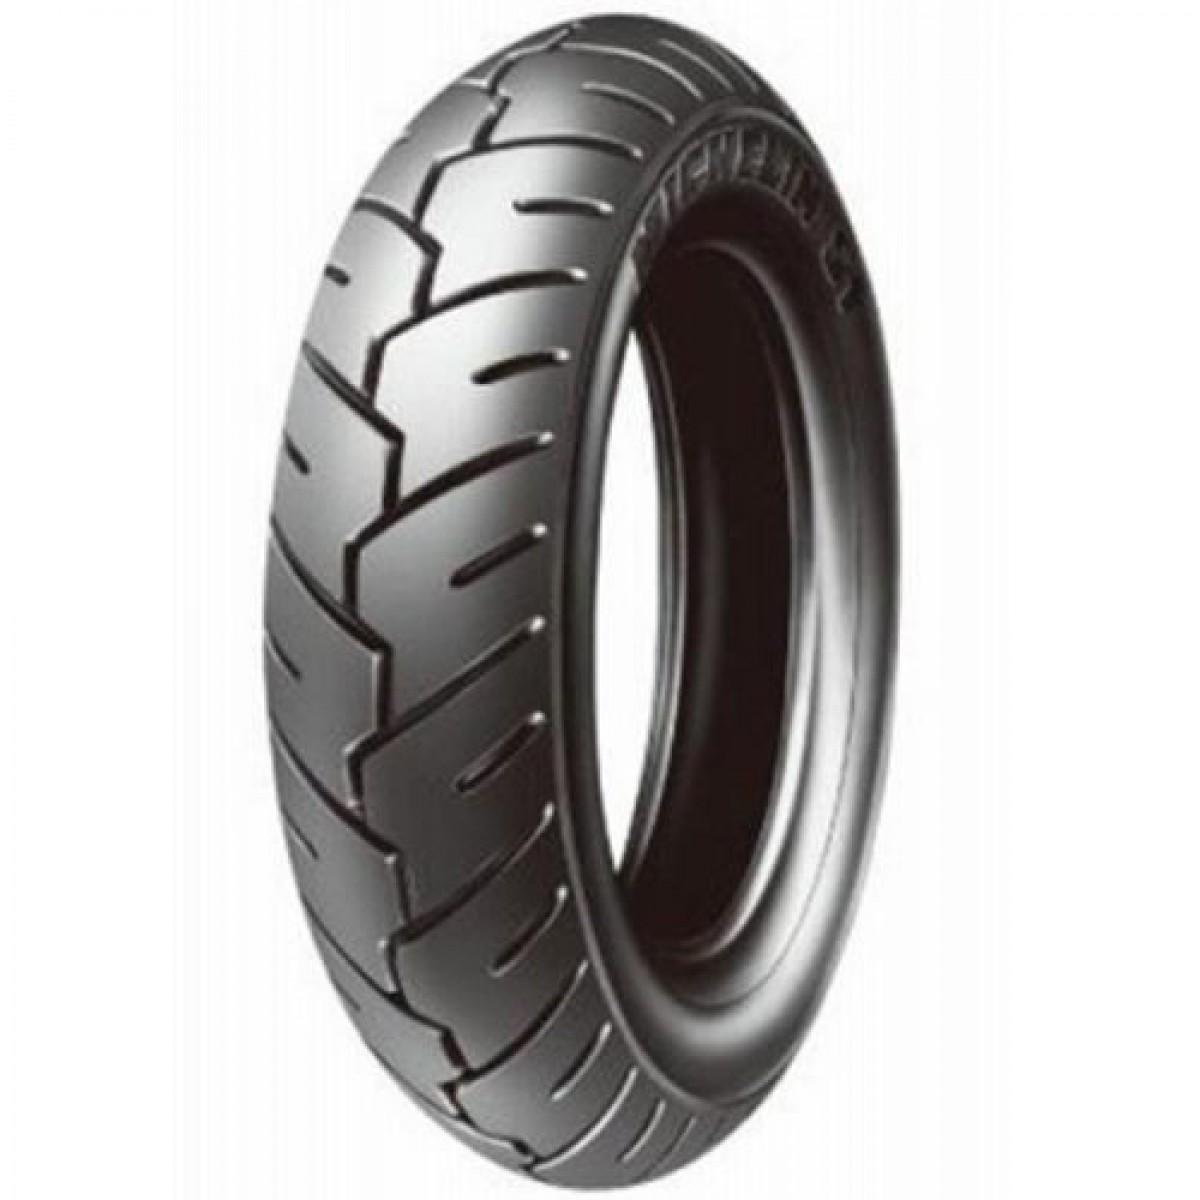 Pneu Michelin 100/90 R10 Polegadas